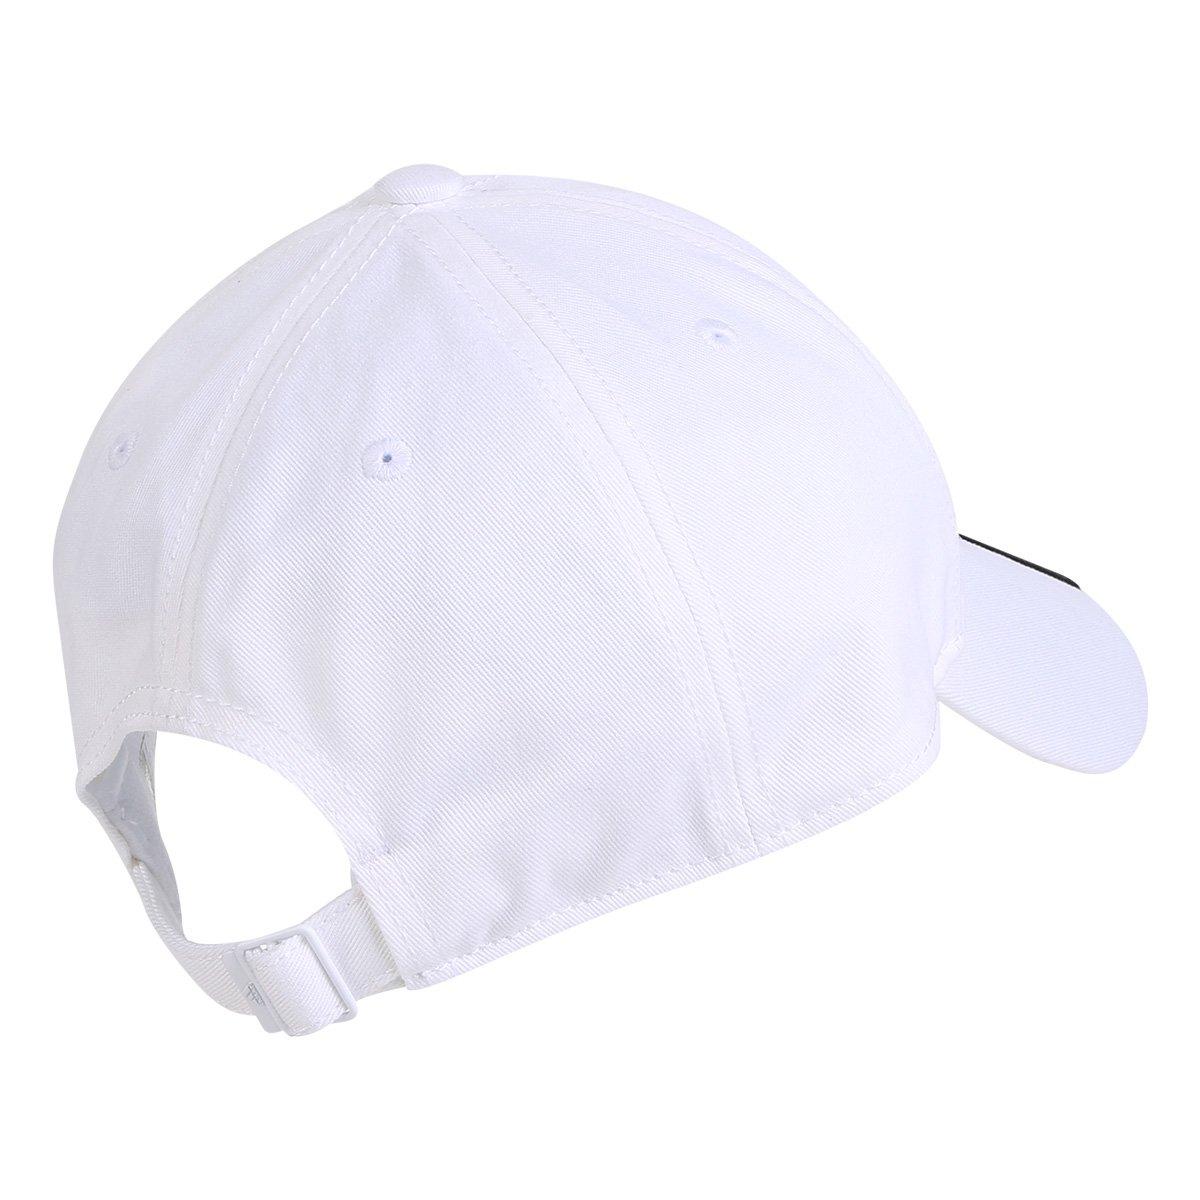 a081d2efc0313 Boné Adidas Ess 3 Stripes Cotton Aba Curva - Branco e Preto | Loja NBA